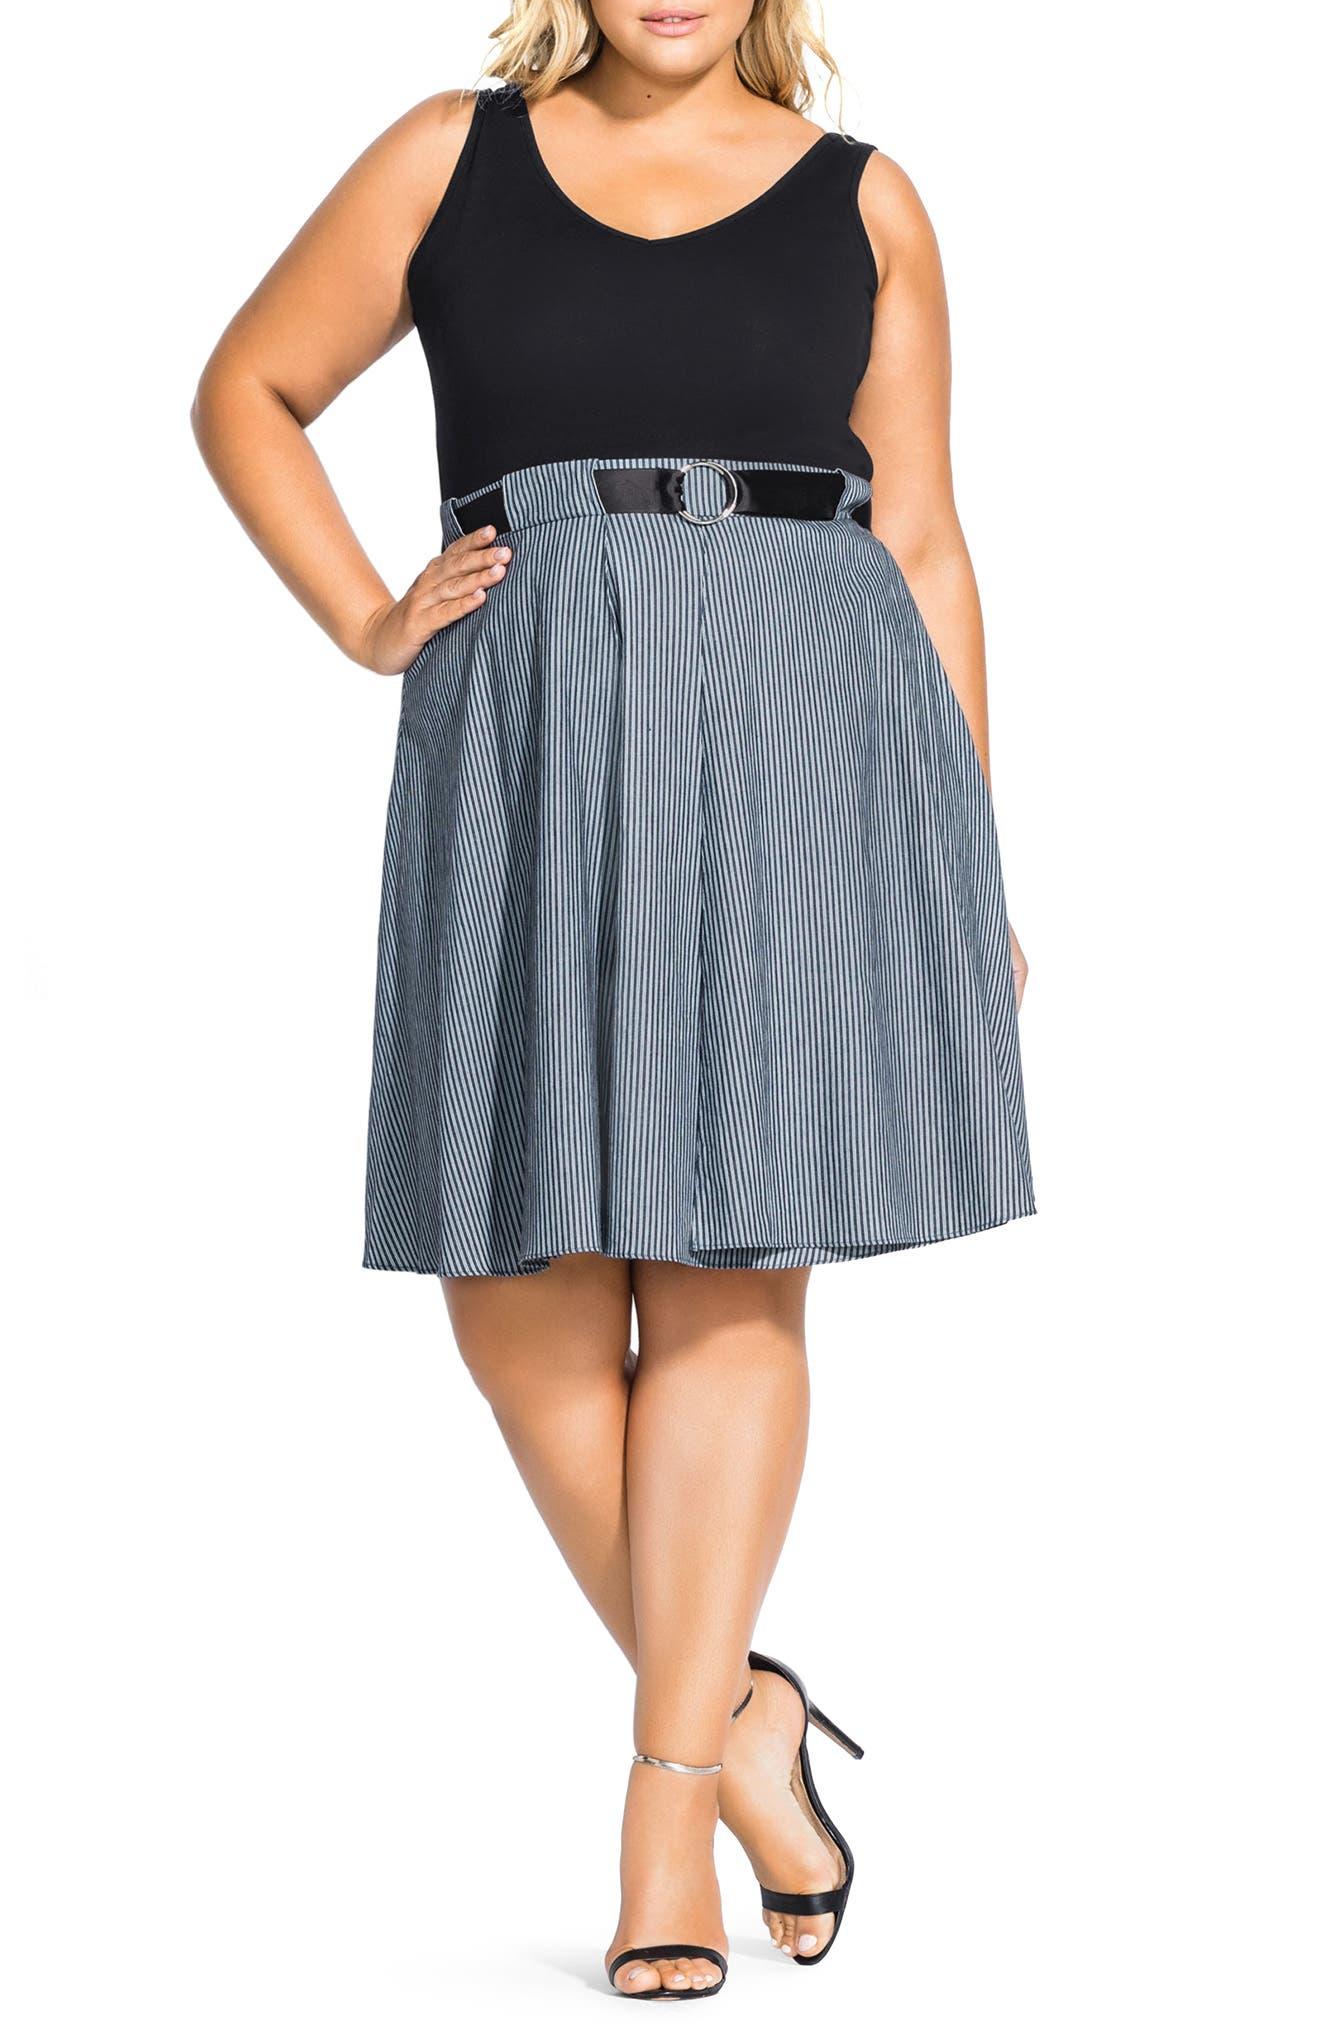 Plus Size City Chic Mix Media Belted Sleeveless Dress, Black